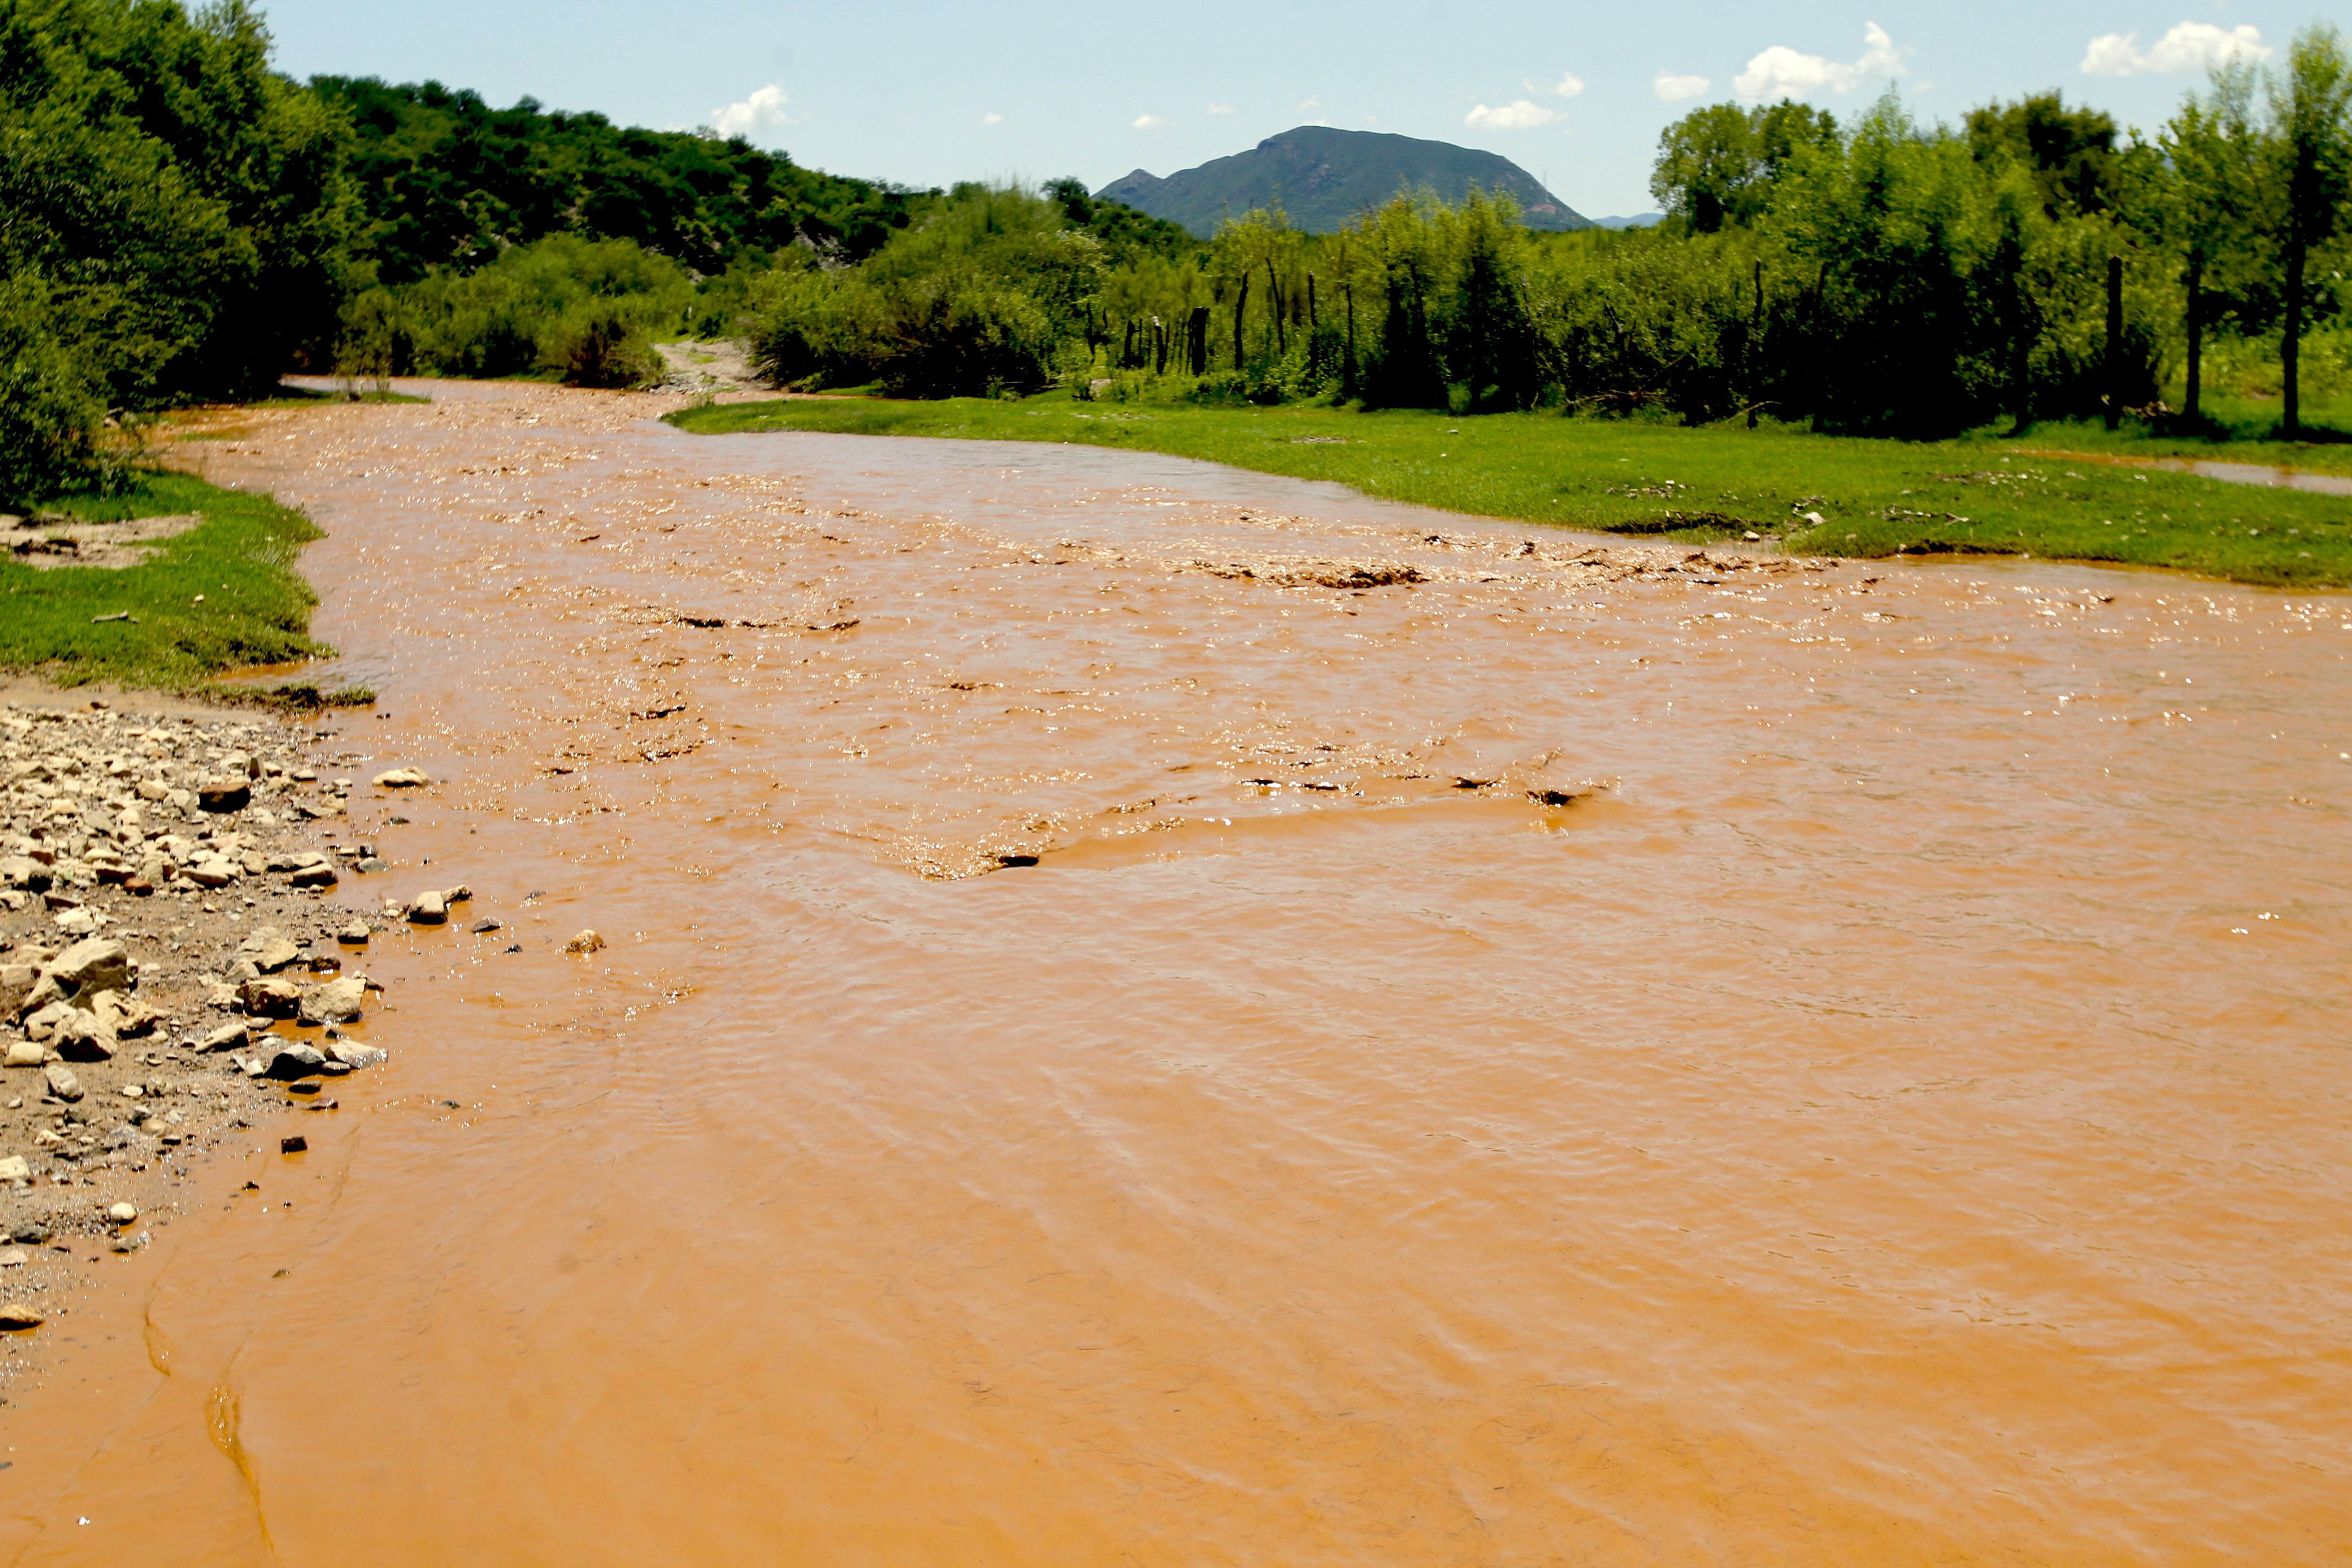 Revisará la SCJN amparo contra Grupo México por derrame tóxico en río Sonora